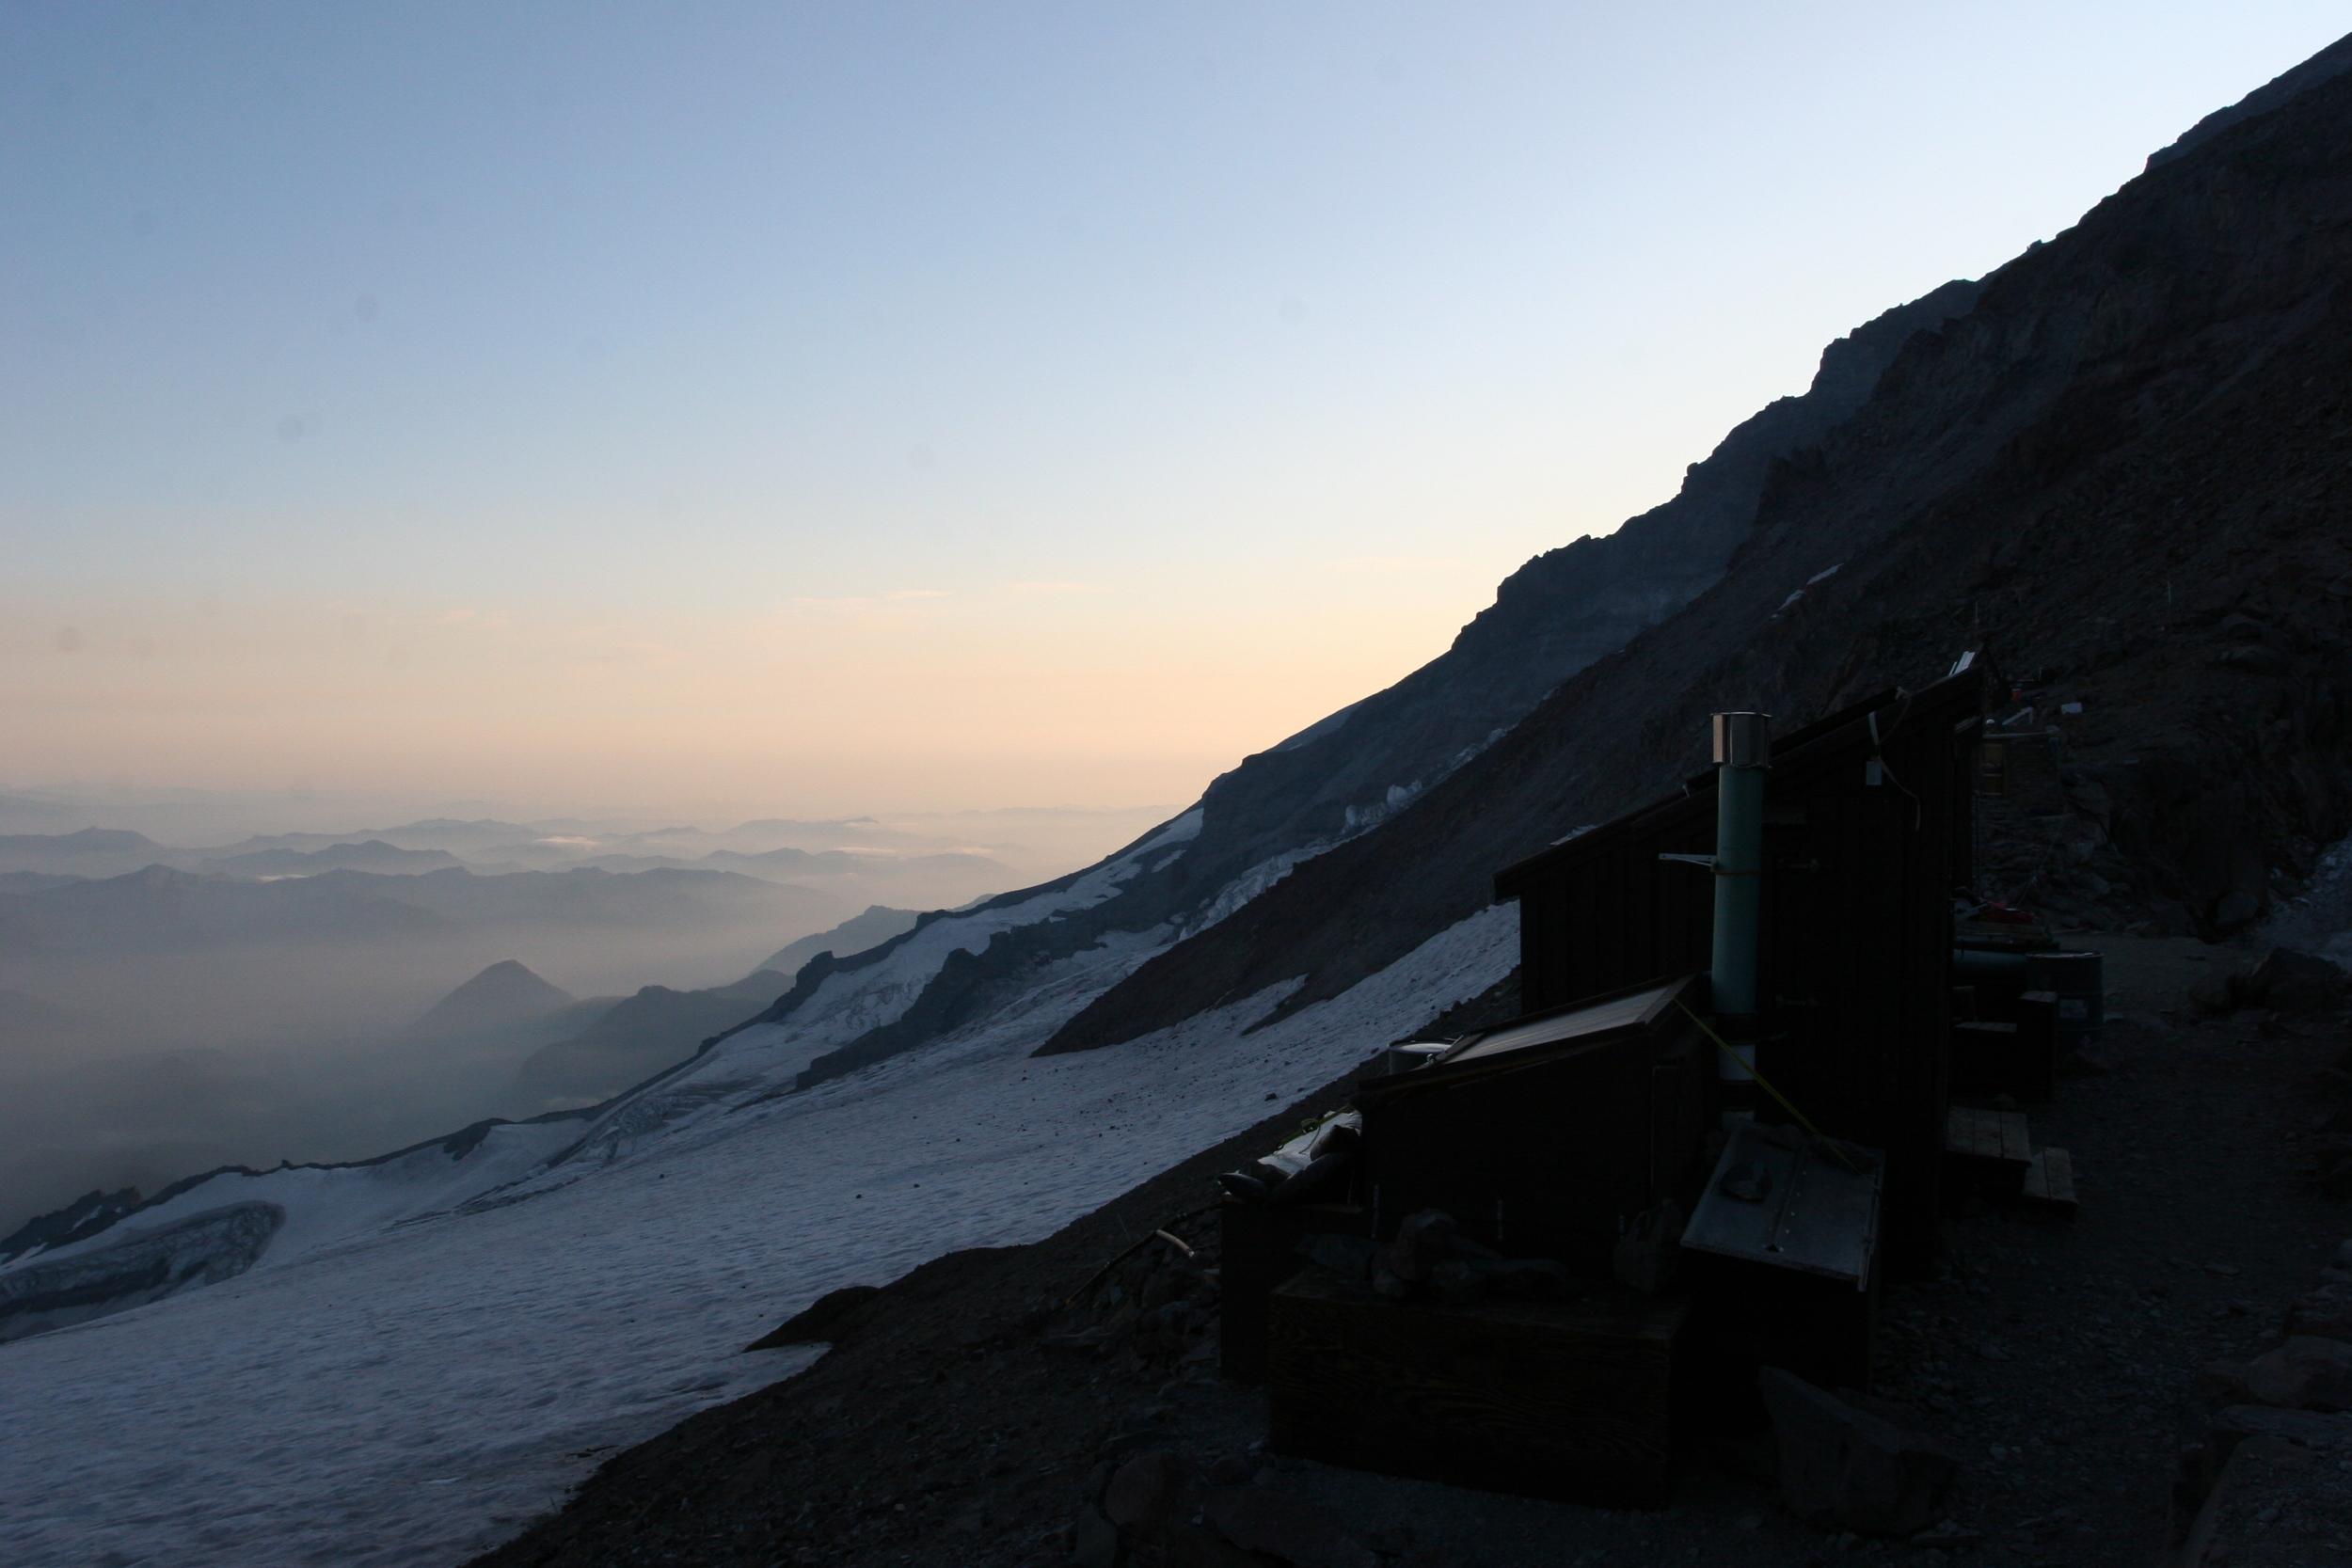 Mount Rainier, Mount Rainier National Park